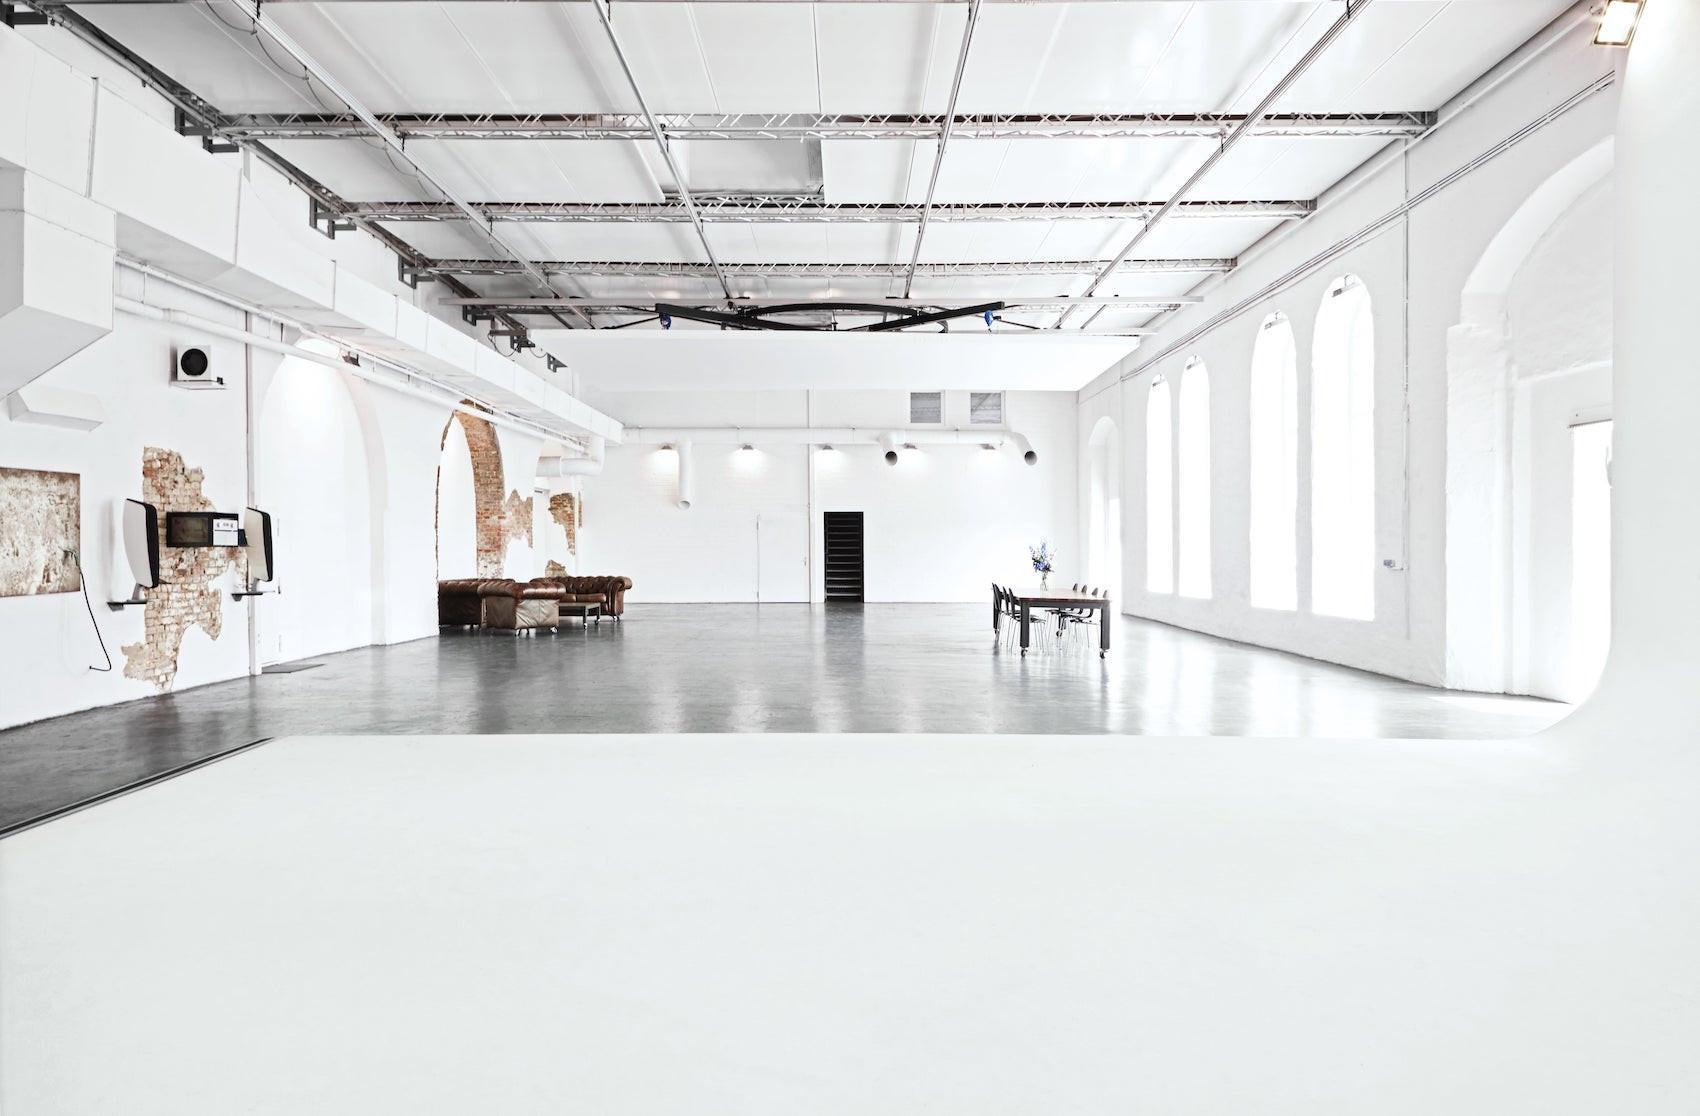 SG_RGB_2018_Mai_Studio1_0033-min.jpg